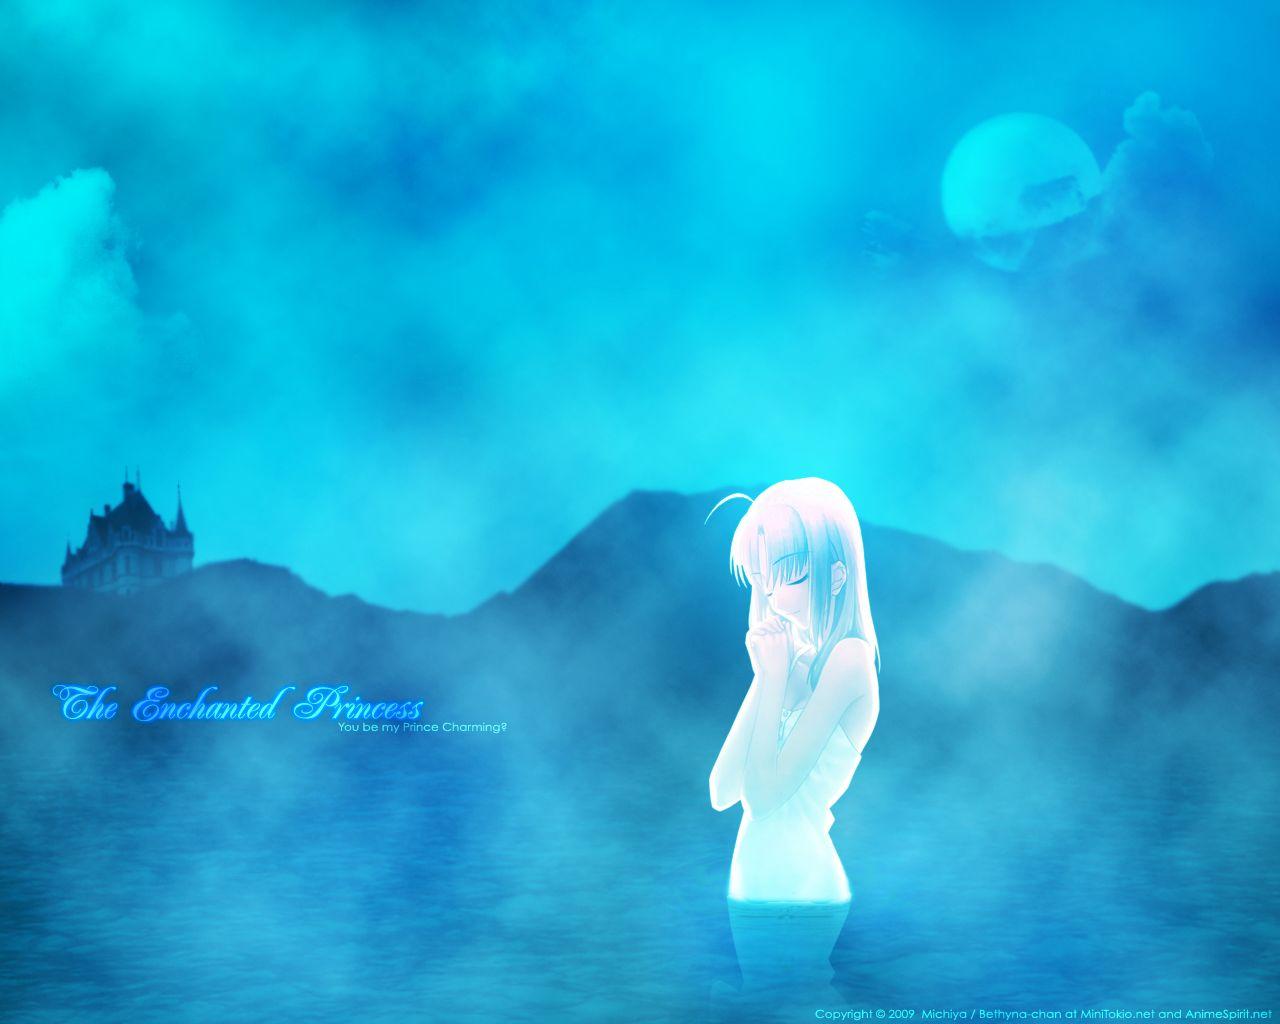 Minitokyo_Fate-Stay_Night_Wallpapers_375589.jpg